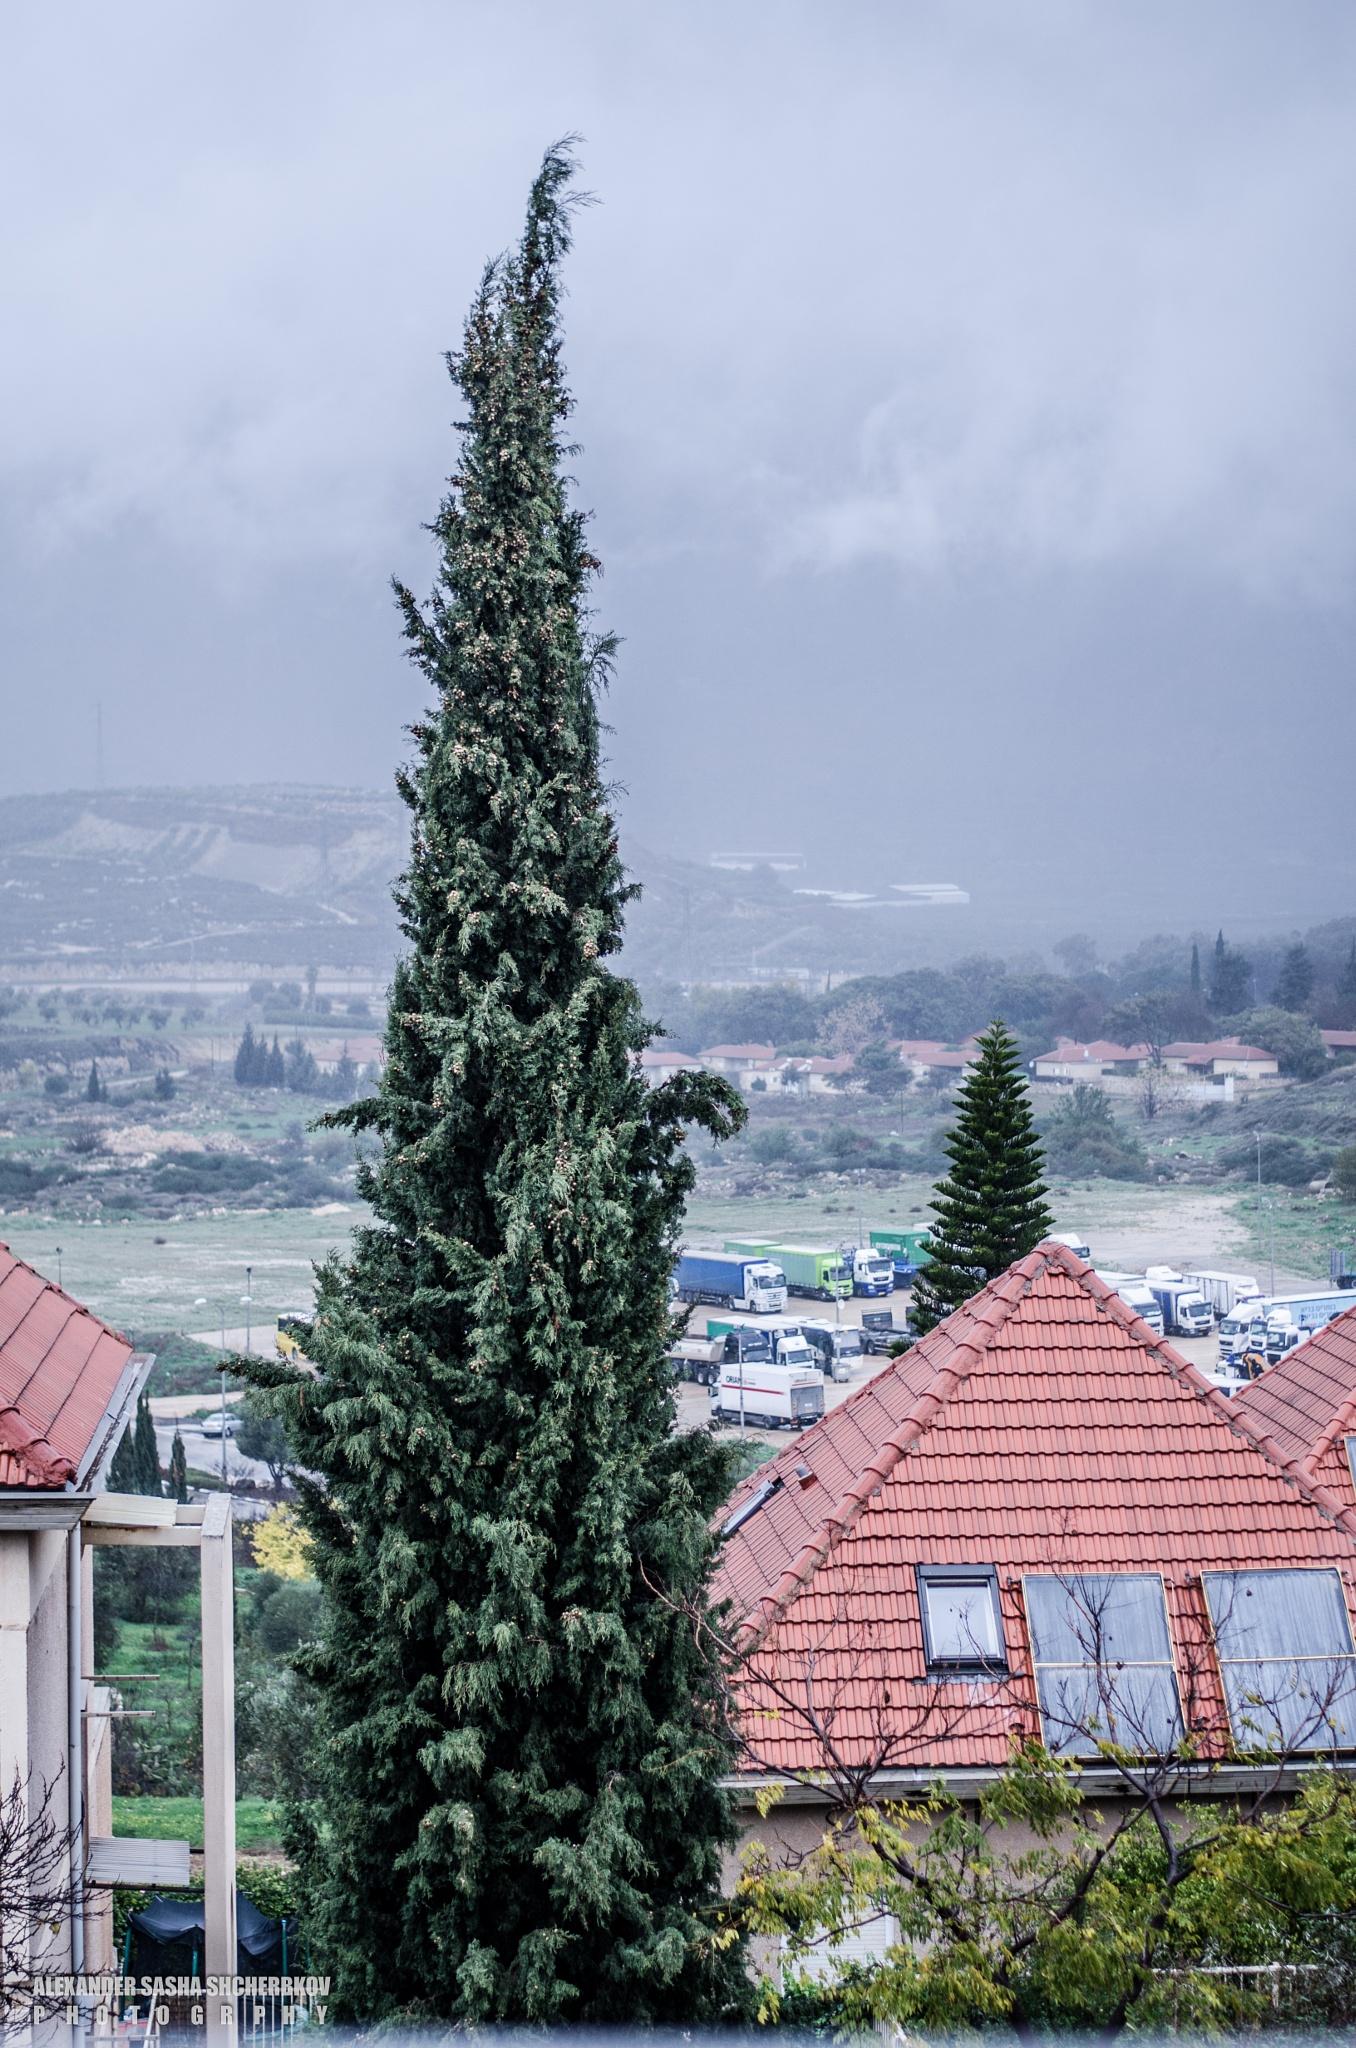 winter in the yard by Alexander Shcherbakov